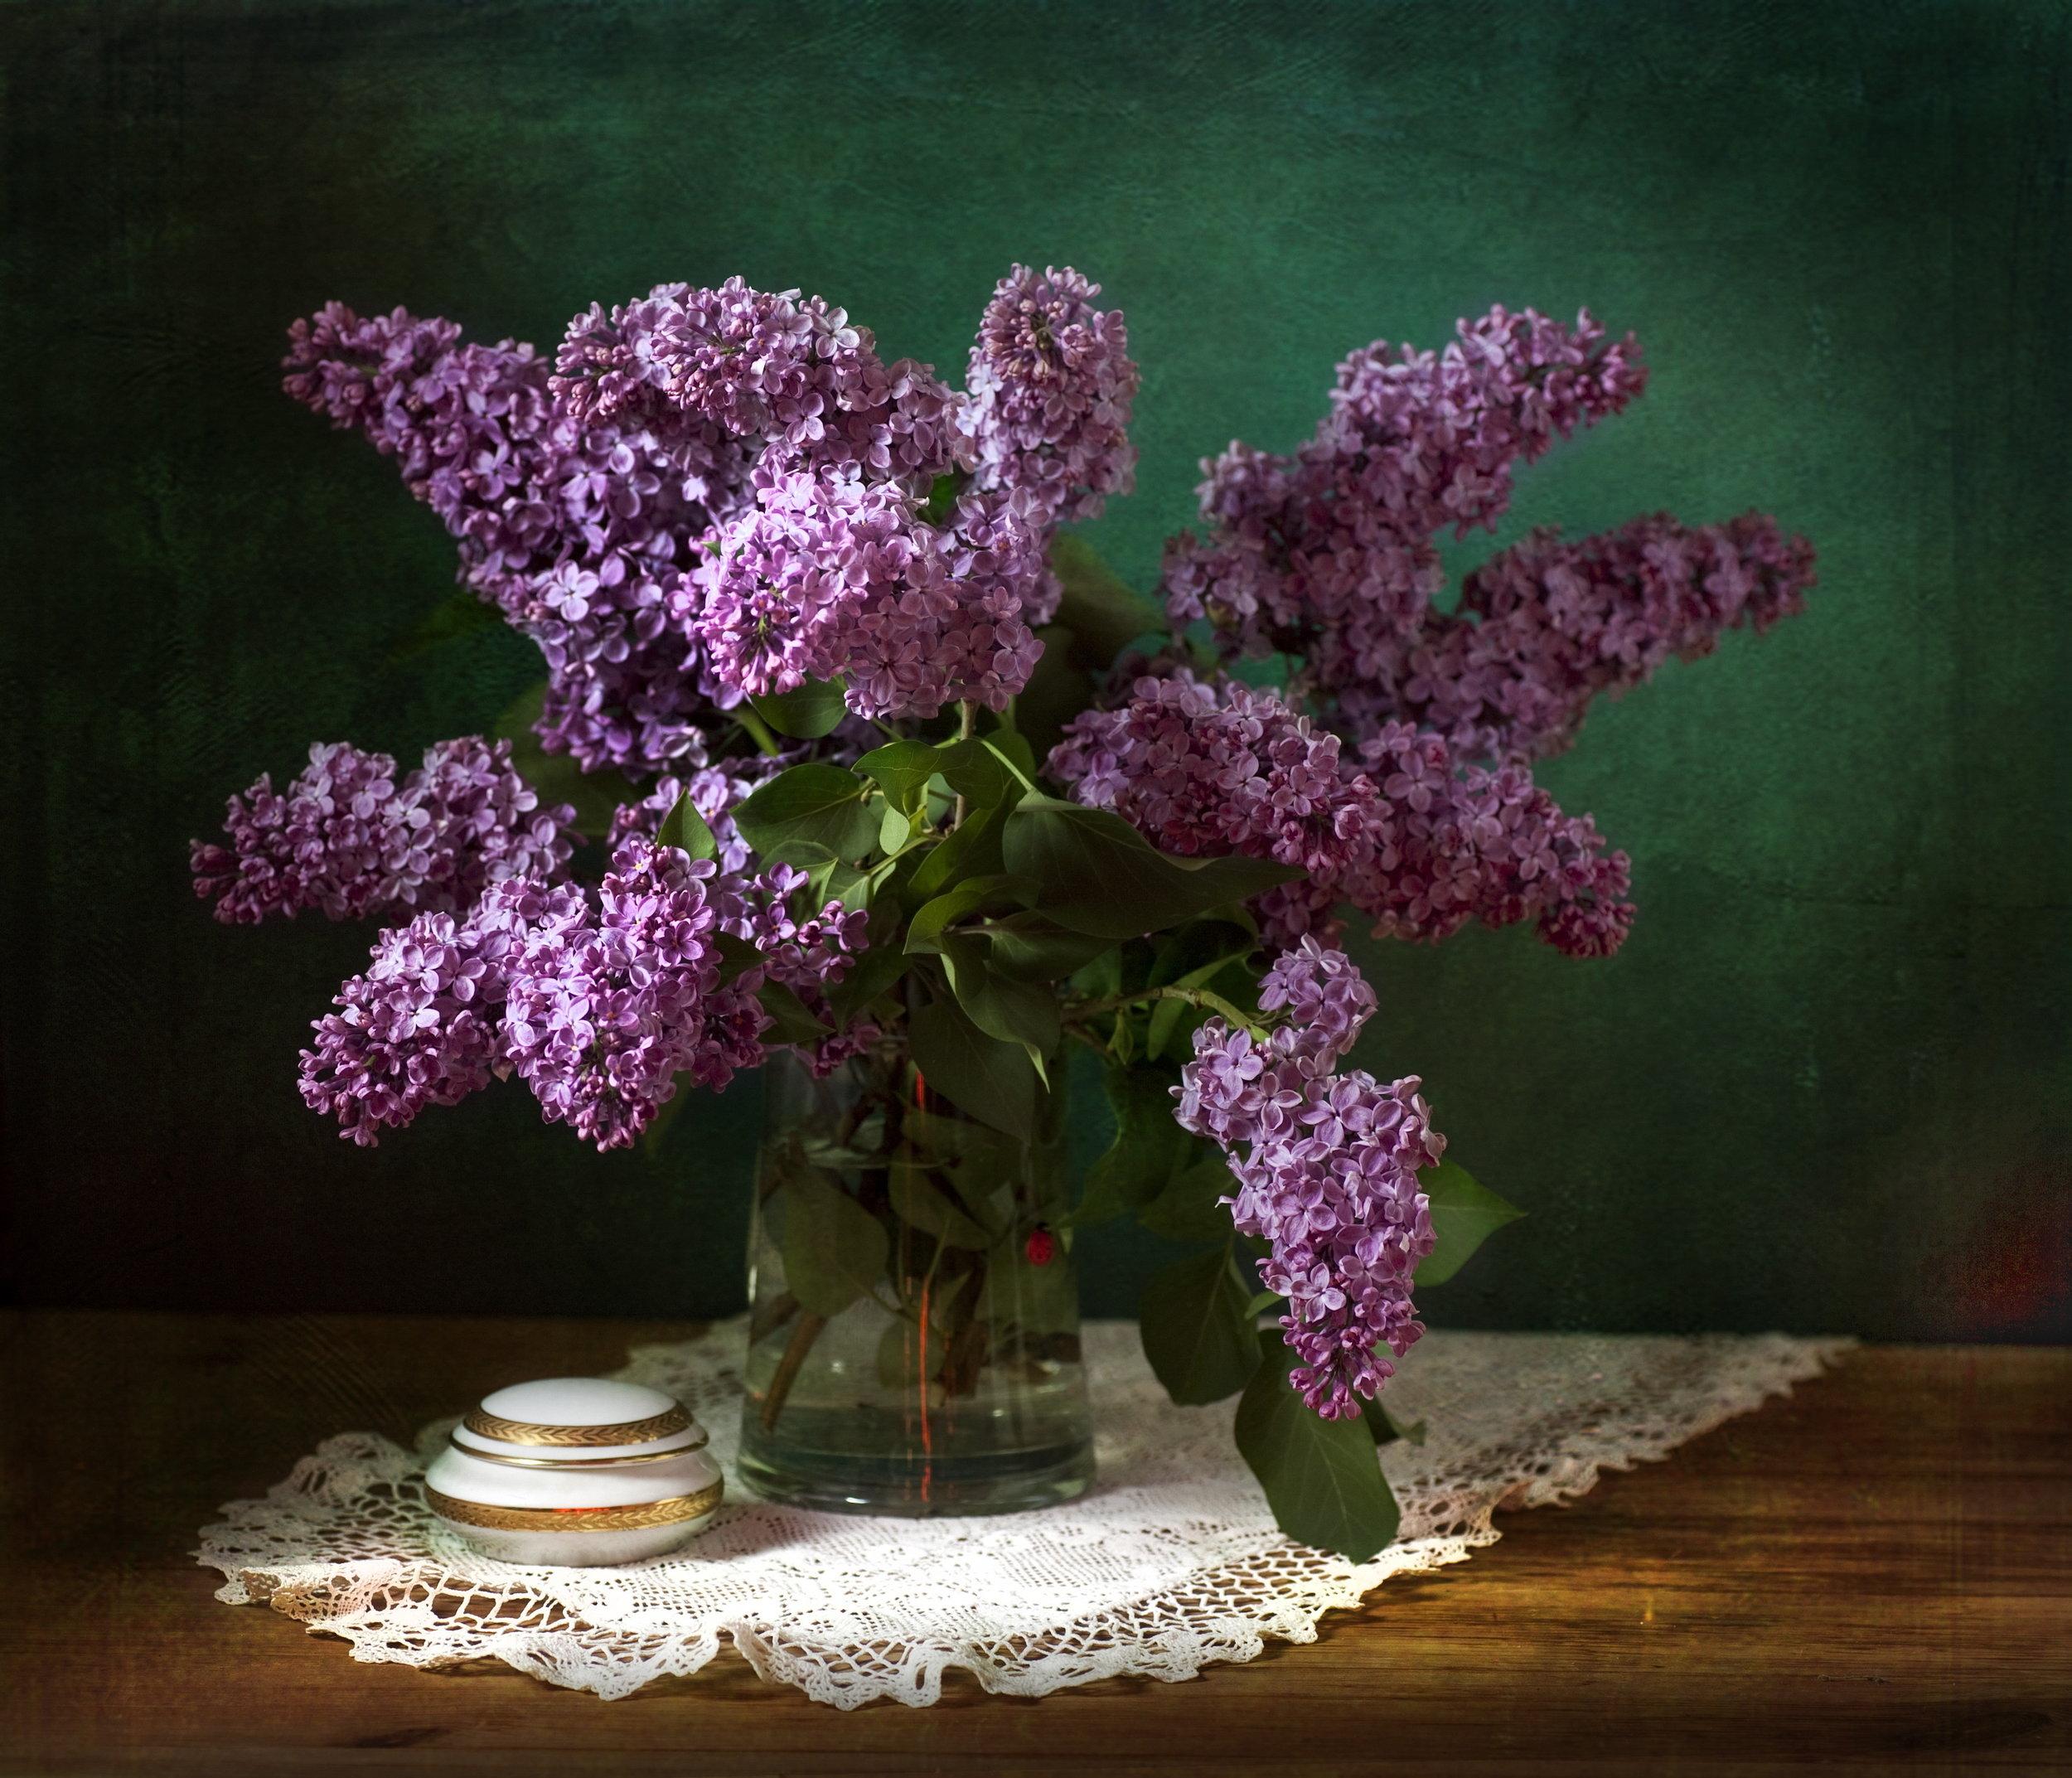 lilac-homestead-brooklyn-Syringa-vulgaris.jpg